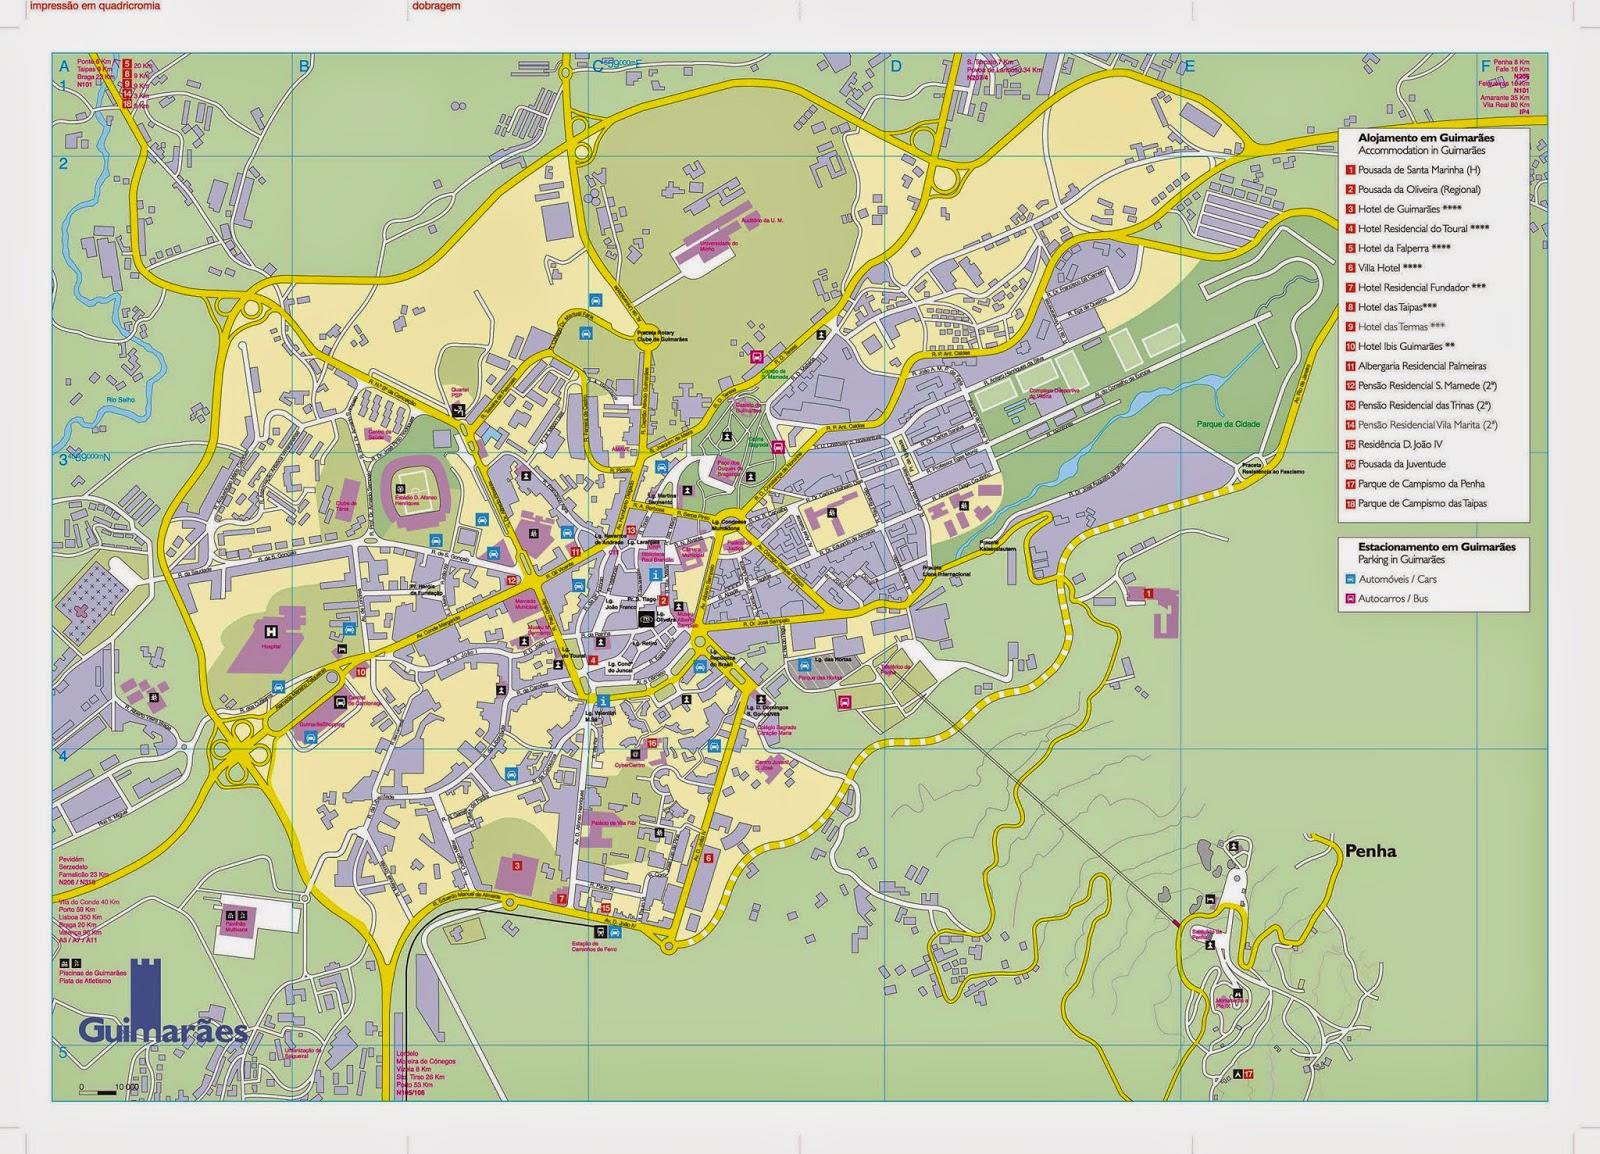 mapa de guimaraes portugal Mapas de Guimarães   Portugal | MapasBlog mapa de guimaraes portugal